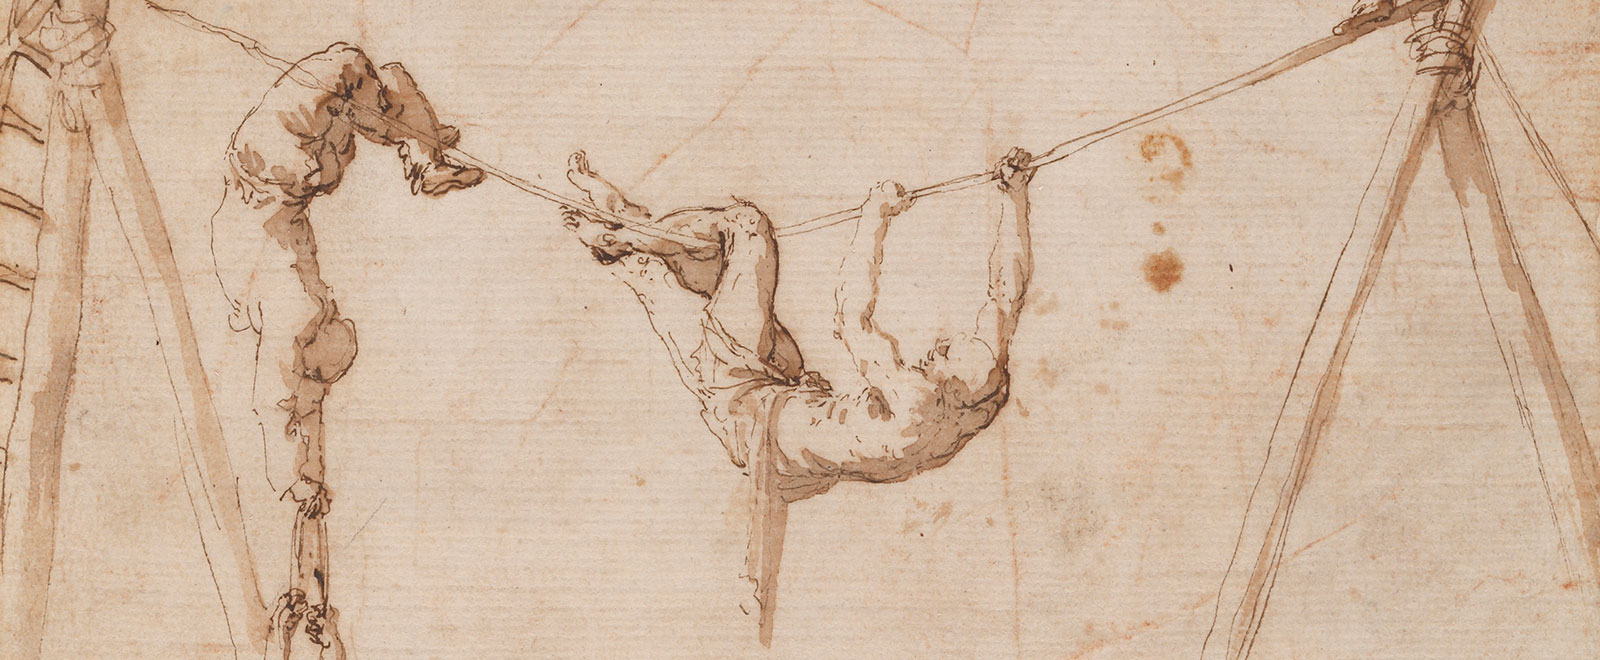 Ribera image